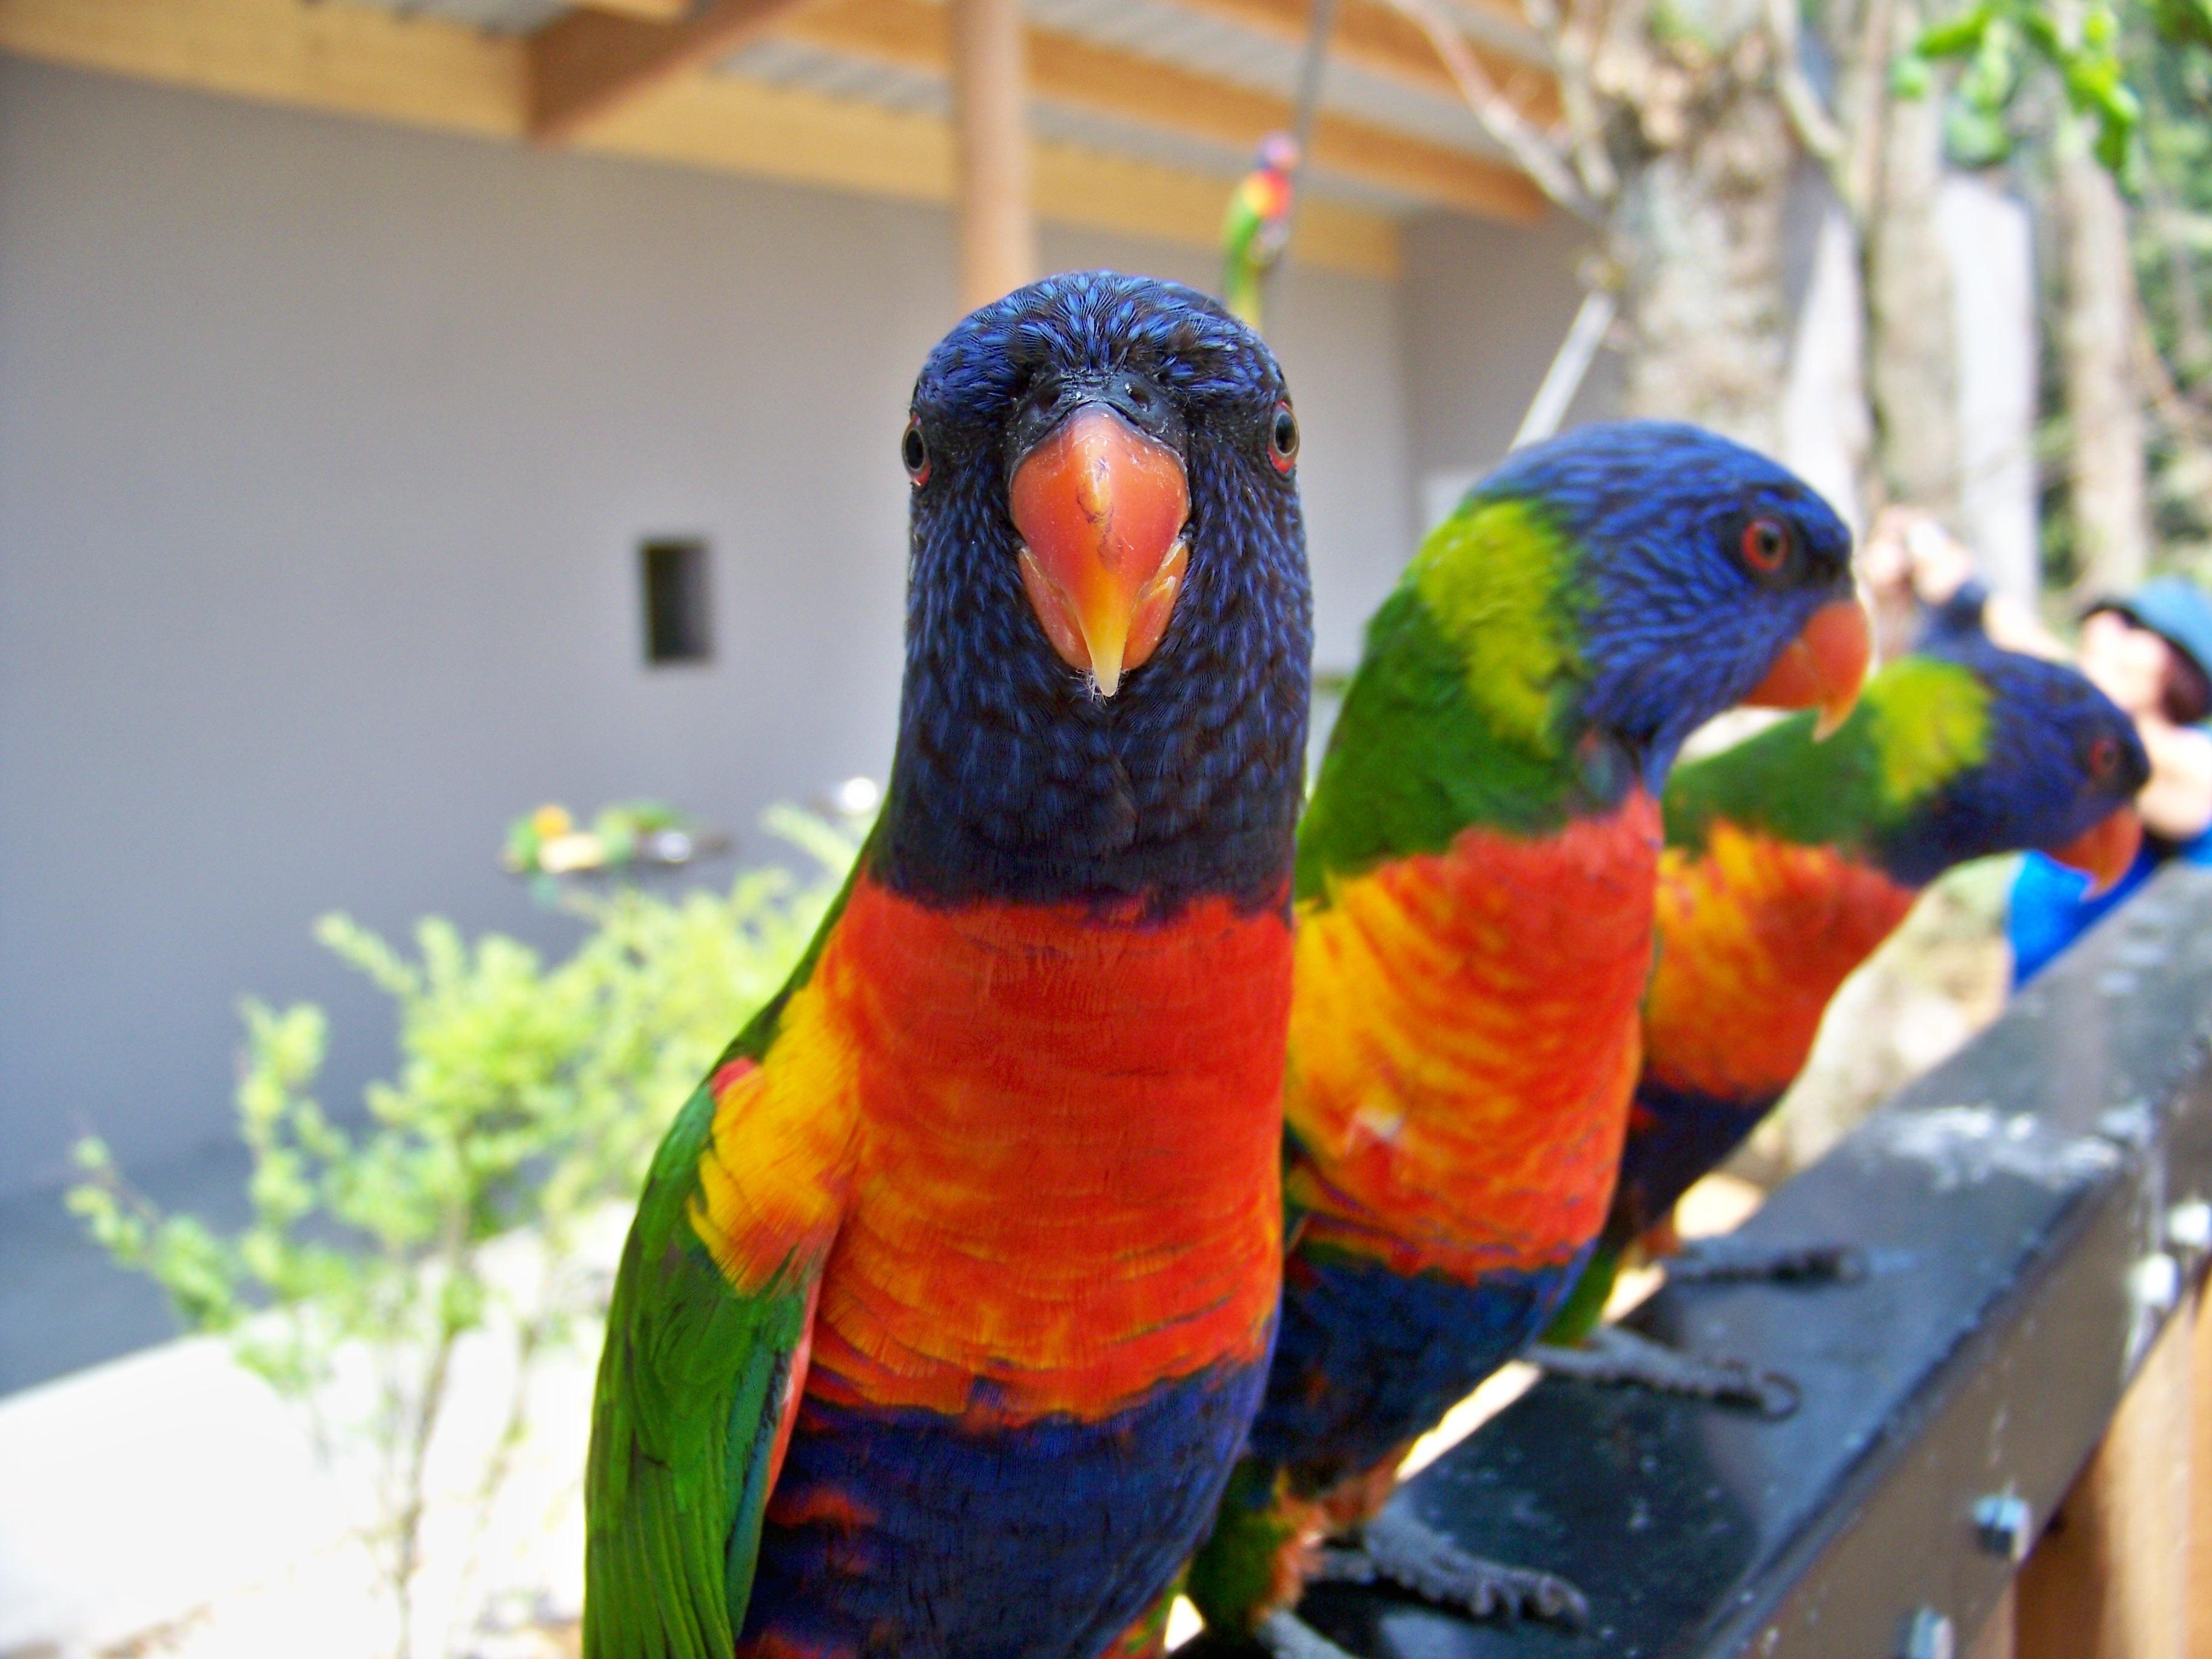 Gambar Paruh Warna Biru Fauna Lorikeet Macaw Burung Burung Melihat Bertulang Belakang Burung Beo Rainbow Parrot Perkici Pelangi Parkit Hewan Peliharaan Umum Lori Merah 3648x2736 1324529 Galeri Foto Pxhere